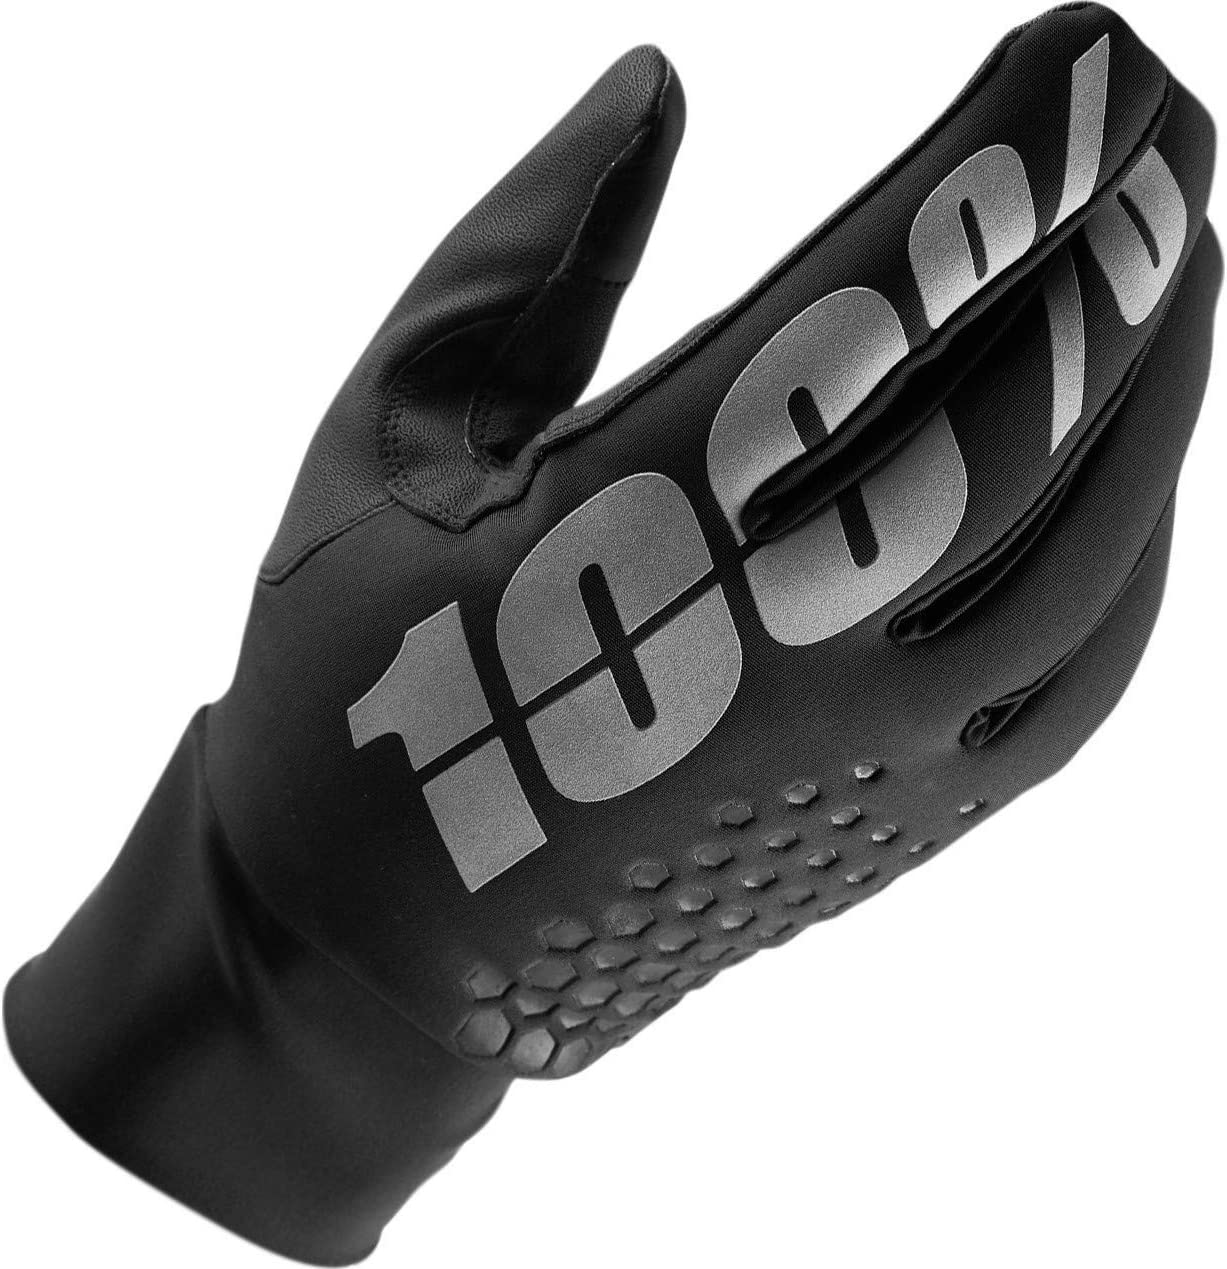 HYDROMATIC Brisker Gloves Black SM